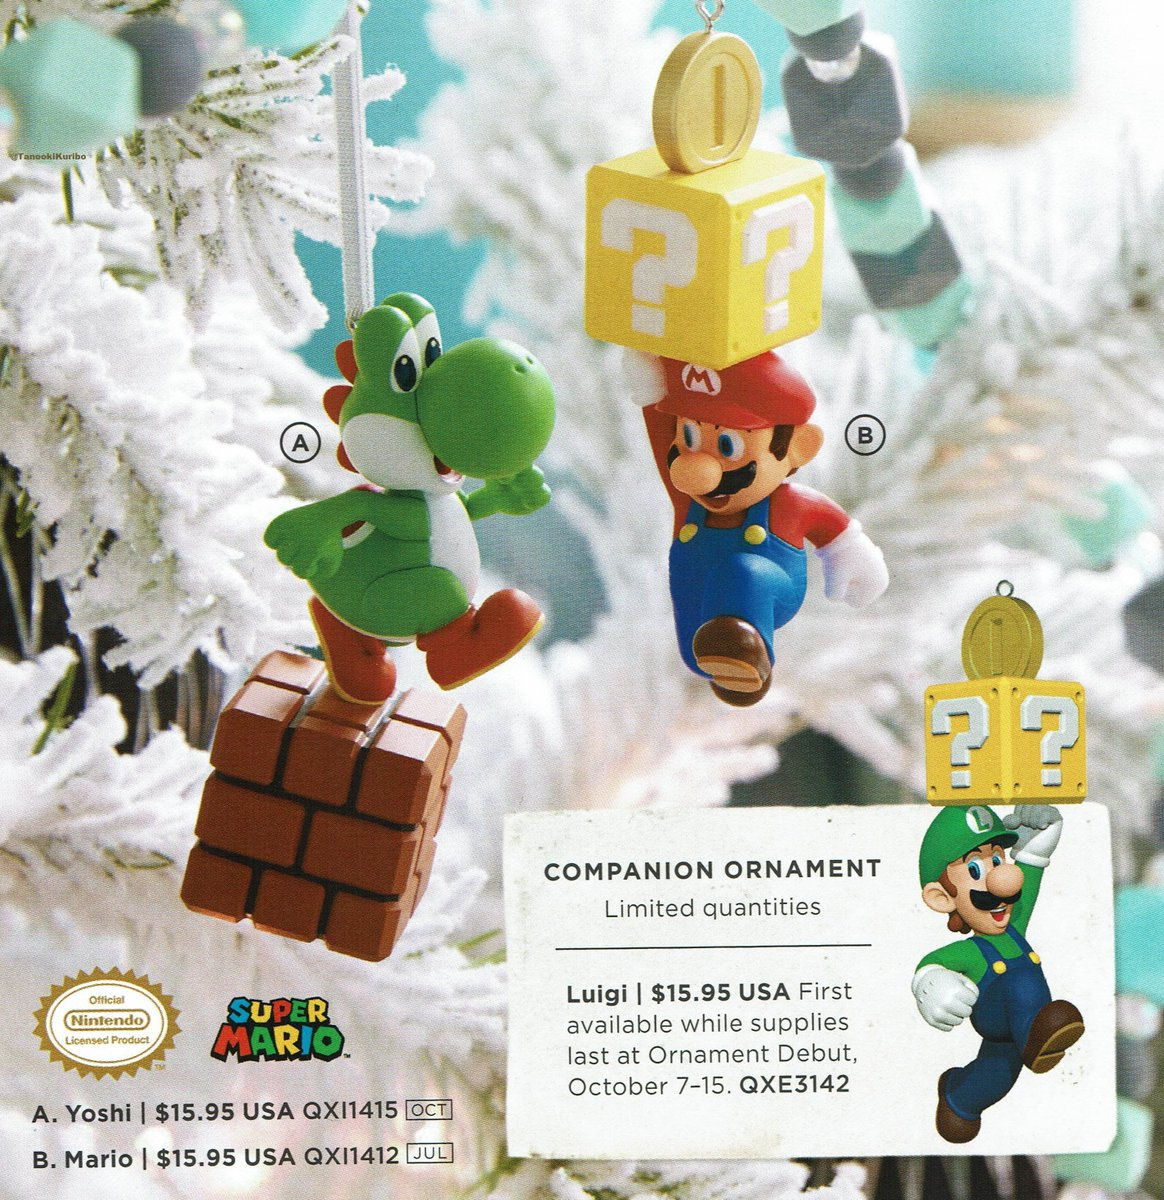 Hallmark planning Super Mario ornaments - Nintendo Everything